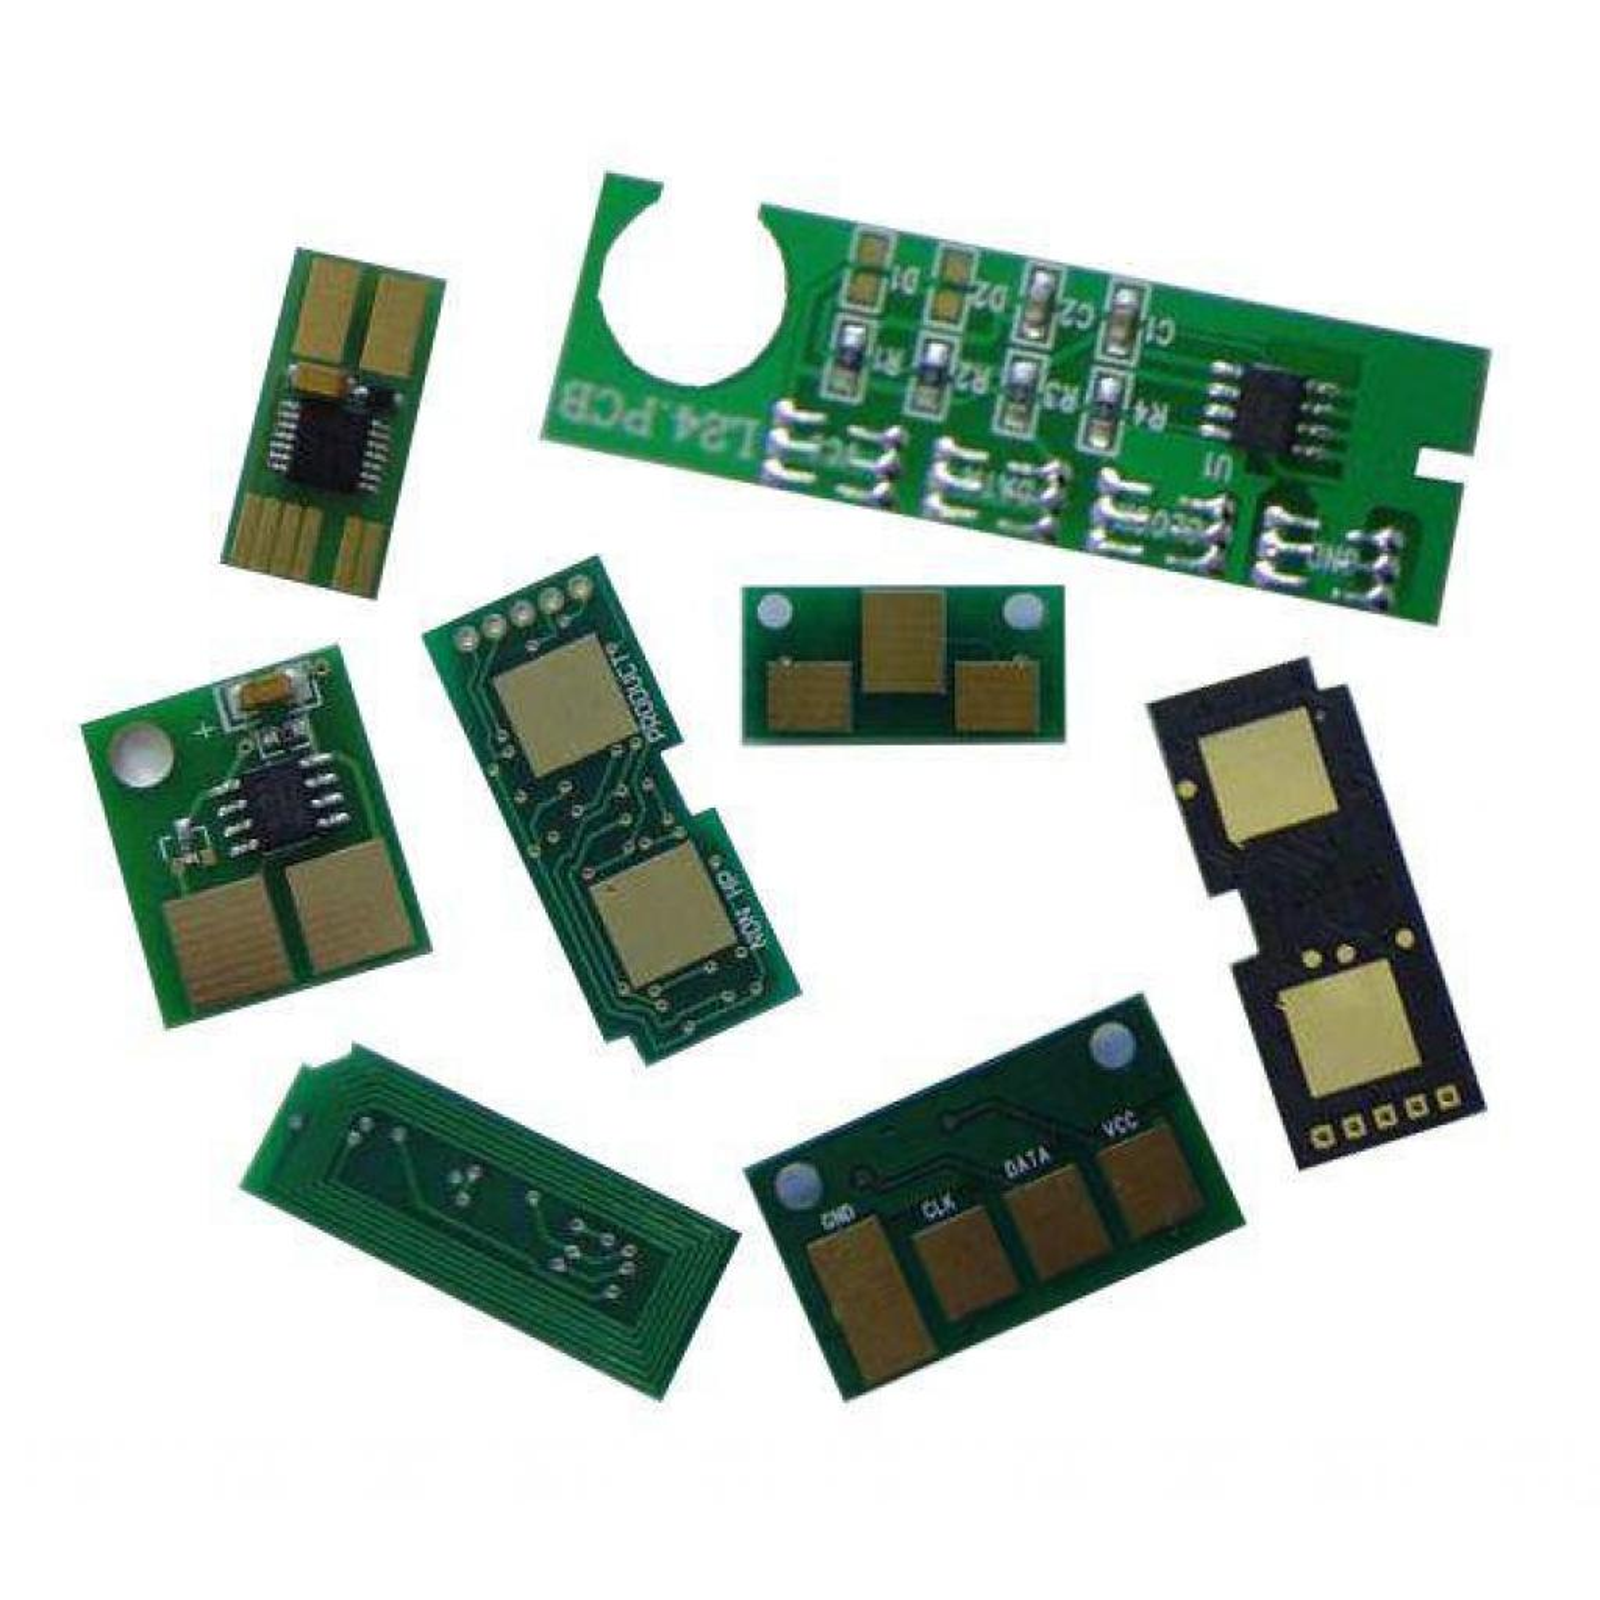 Чип для картриджа RICOH SP111 110E 2K Everprint (CHIP-RIC-SP111)